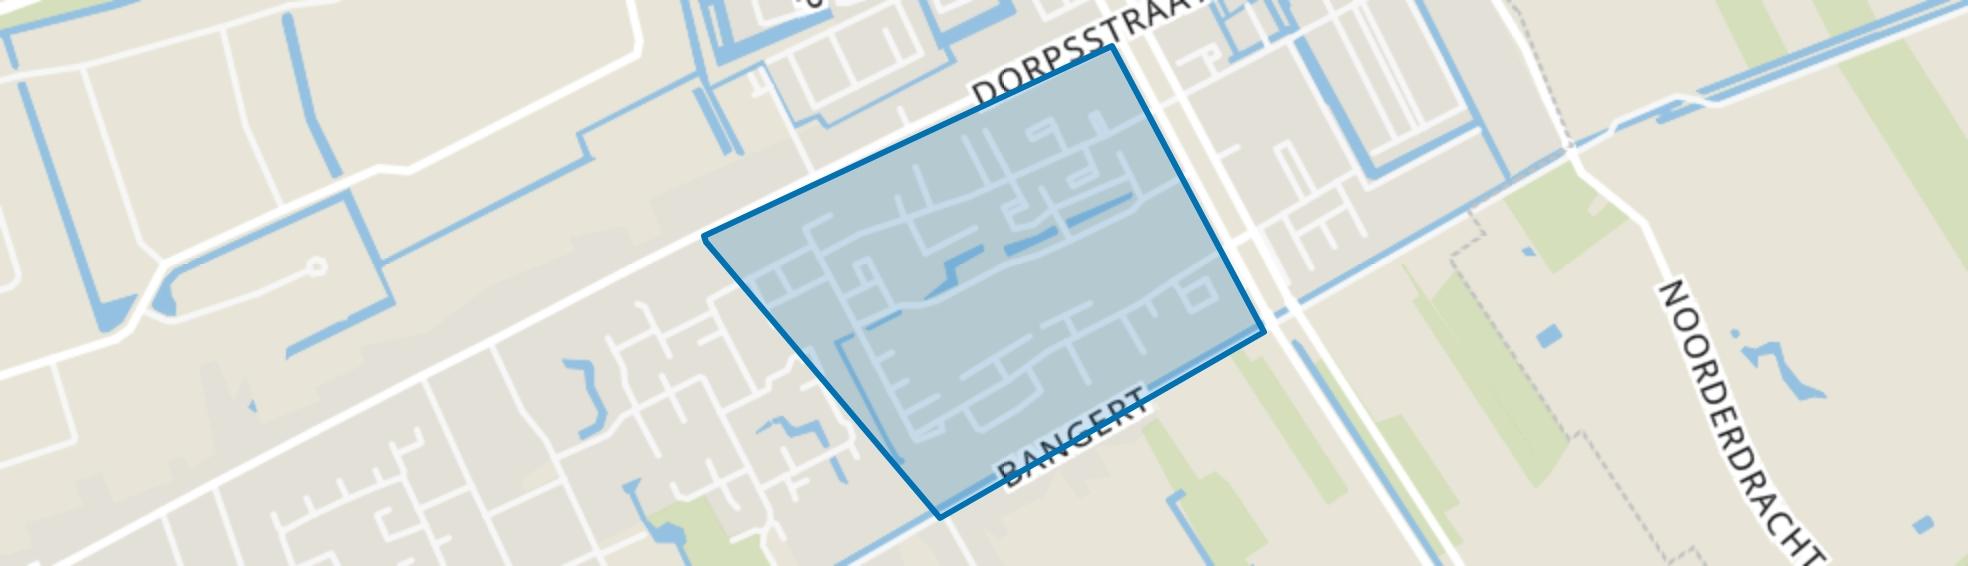 Bangert en Oosterpolder - Buurt 35 03, Zwaag map